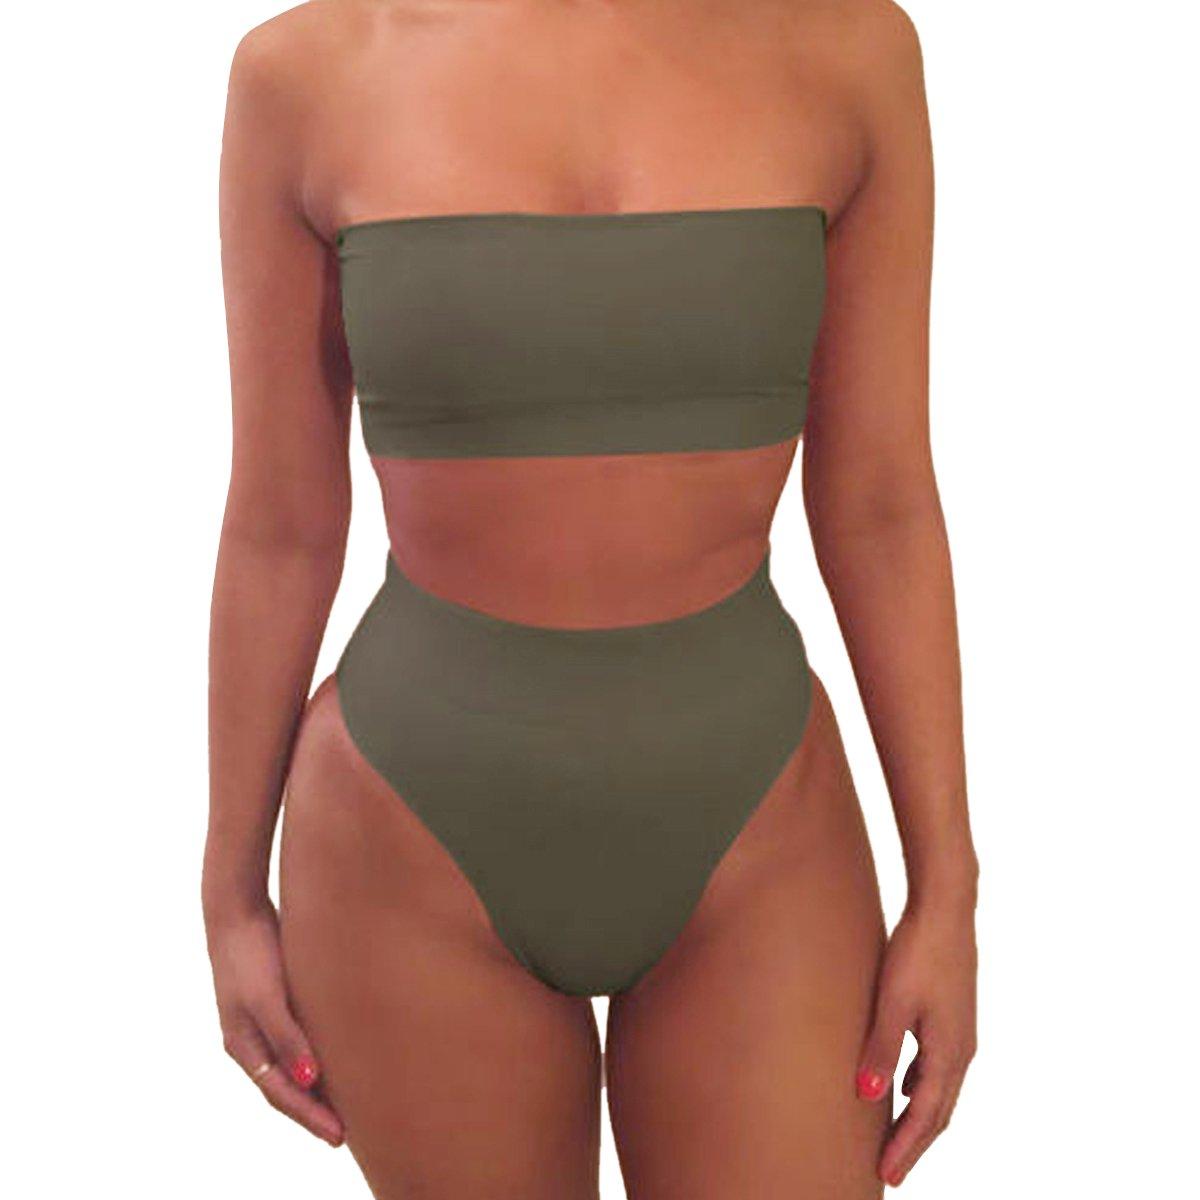 b566b296e87 Fashion Hoodies & Sweatshirts QINSEN Womens Tie Knot Front High Waist Thong  Bandage 2PCS Bikini Sets ...